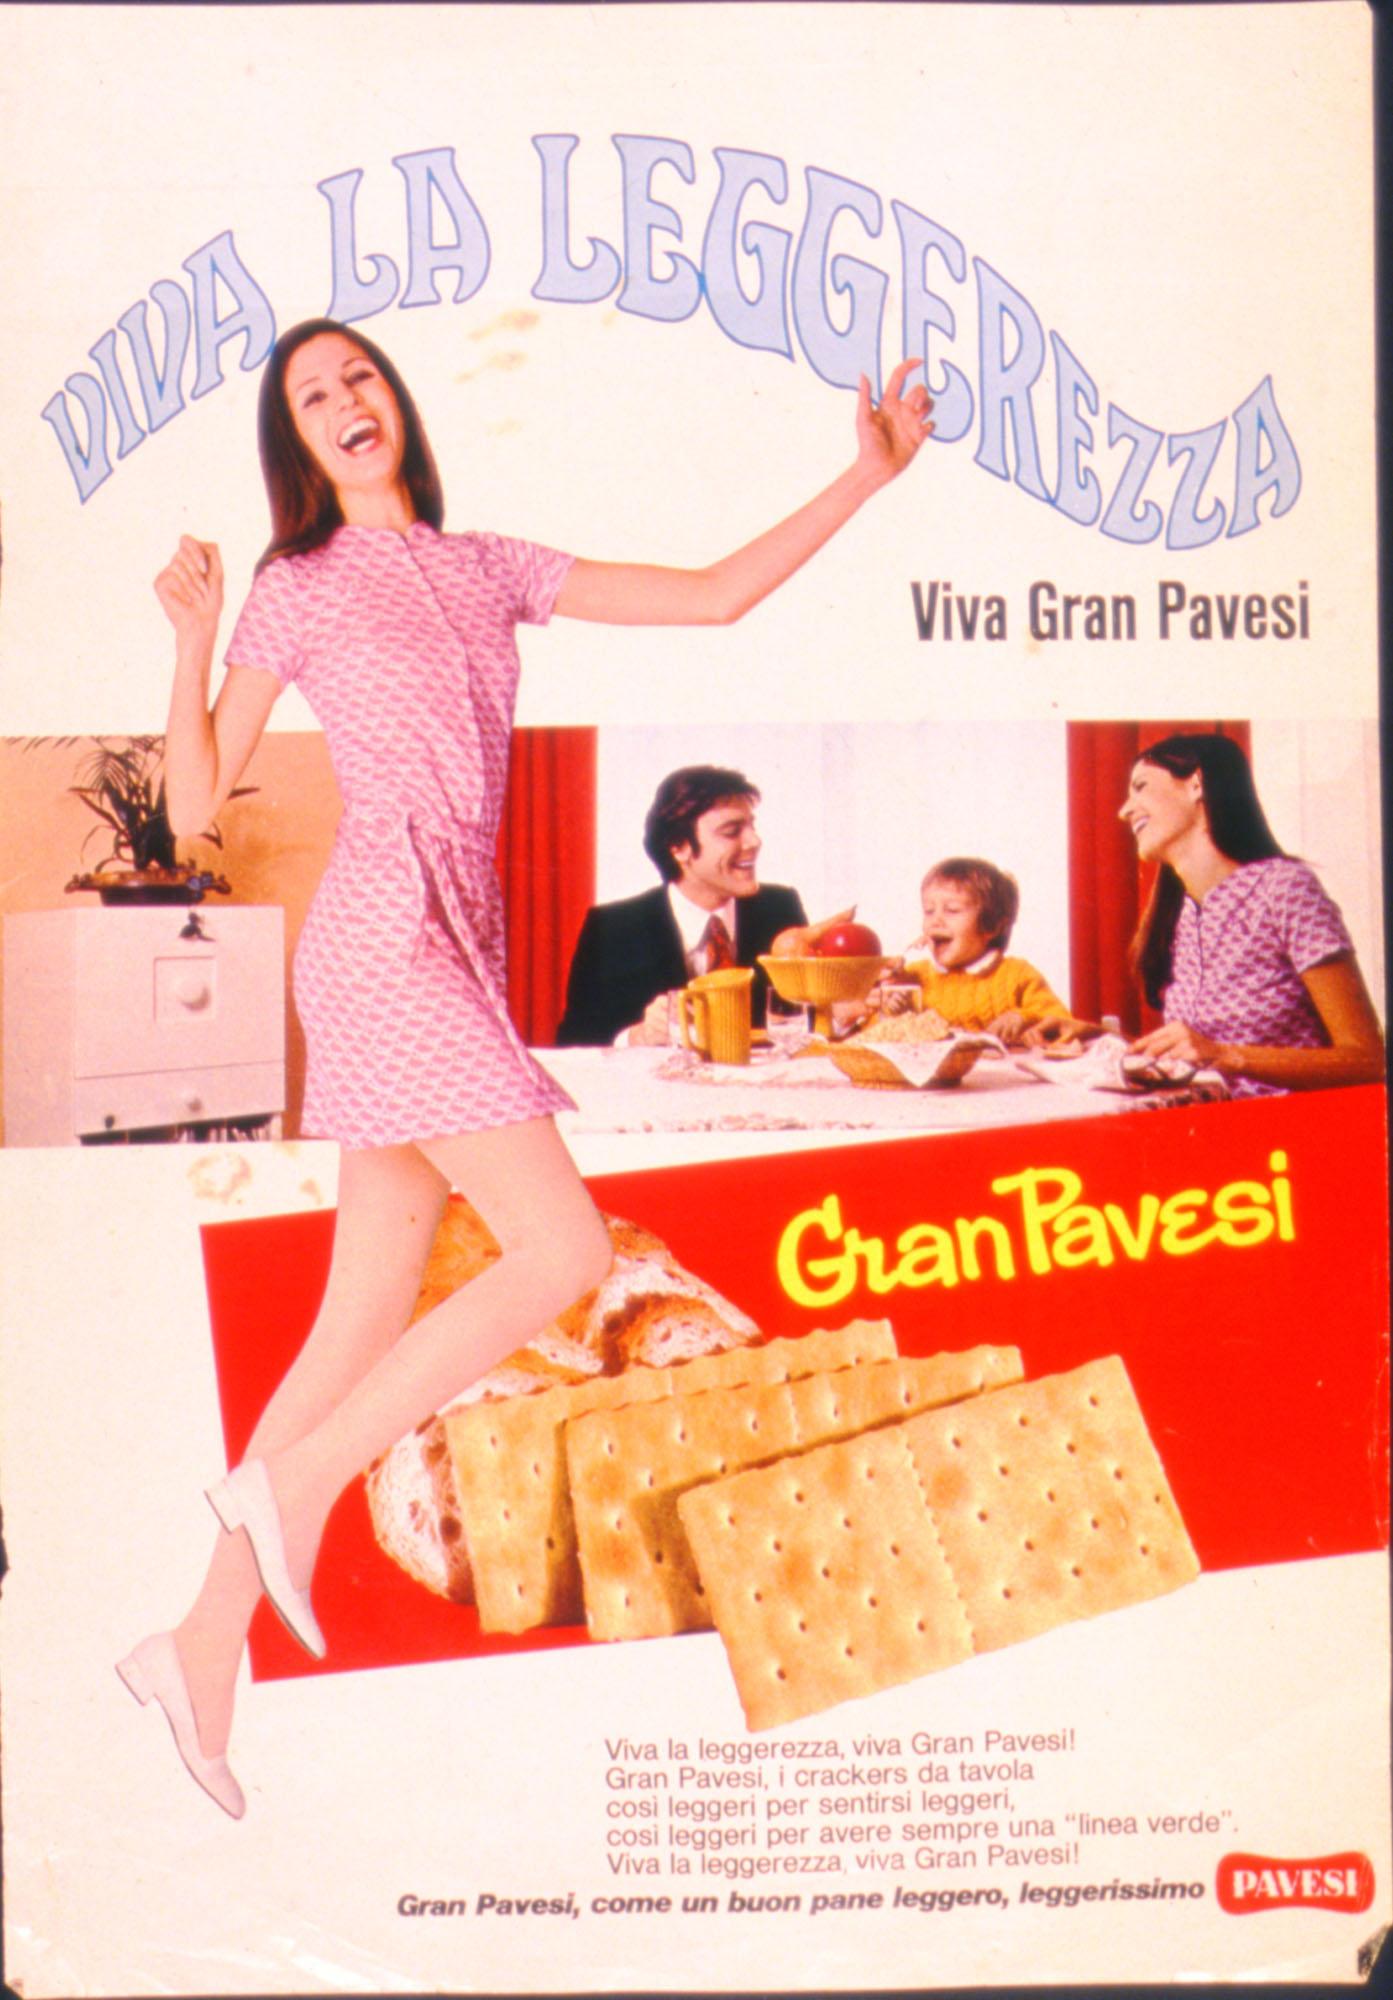 Press advertising Gran Pavesi Crackers, 1970-1972